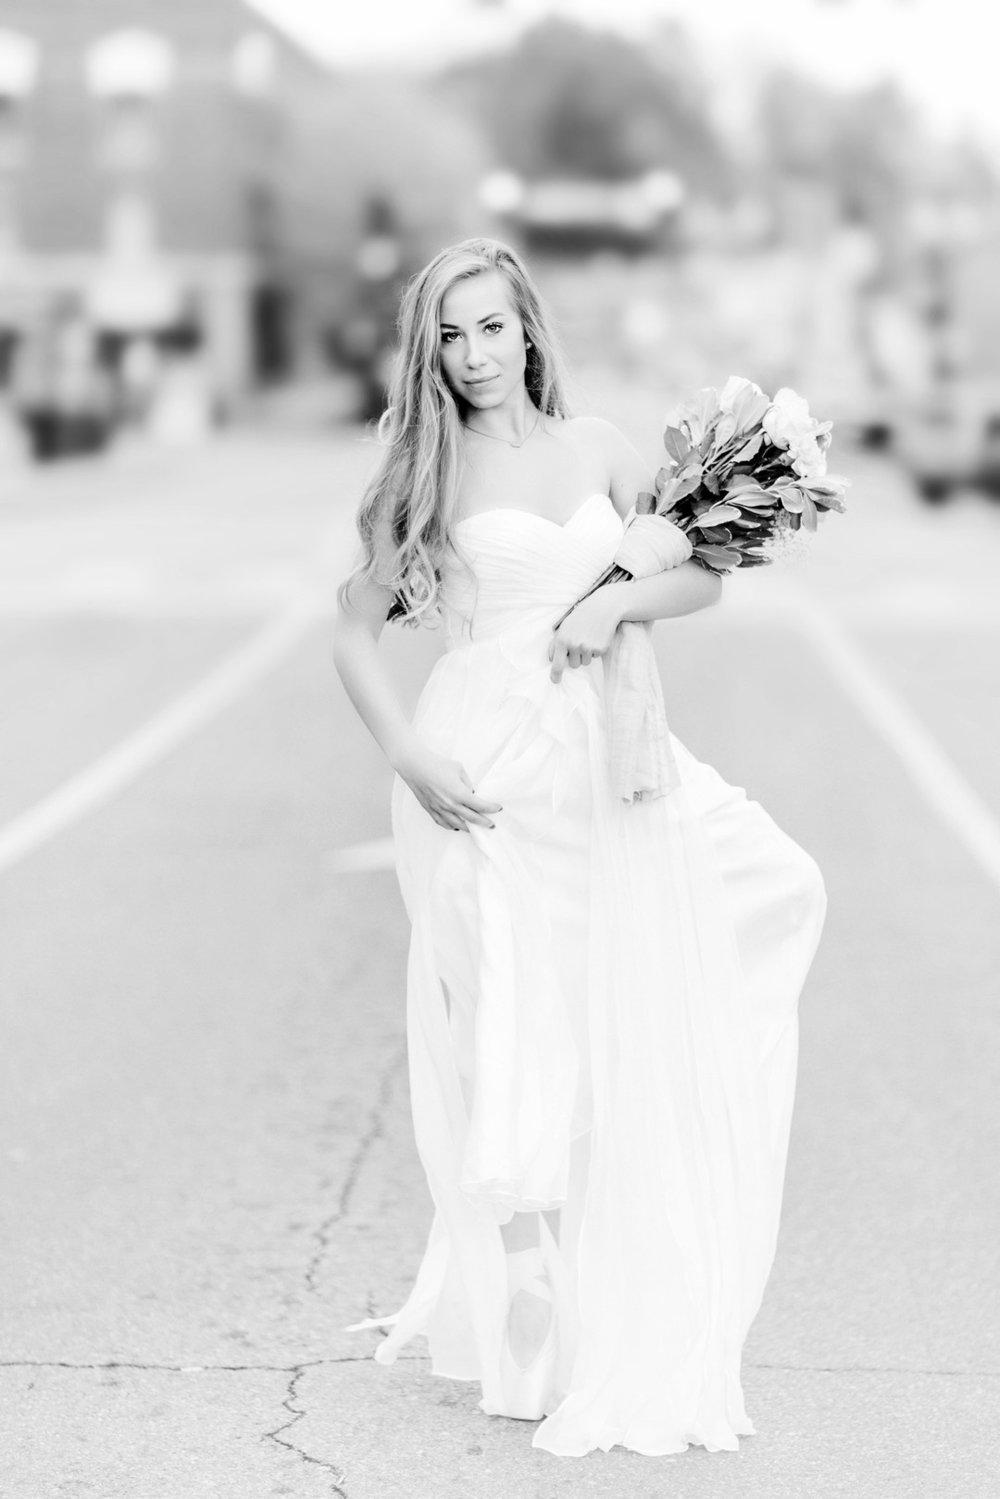 Coleman_SamanthaColemanPhotography_C83A88291_big.jpg